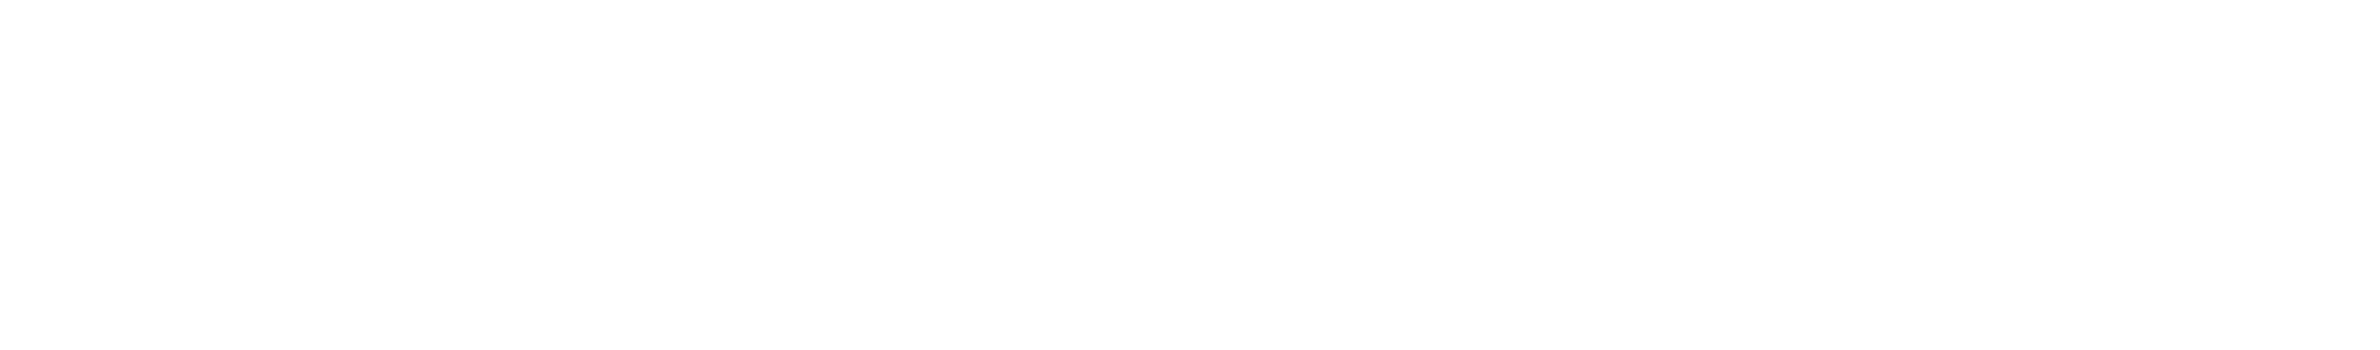 f60ce425-ef16-47bd-a213-7c018afd3a59.png